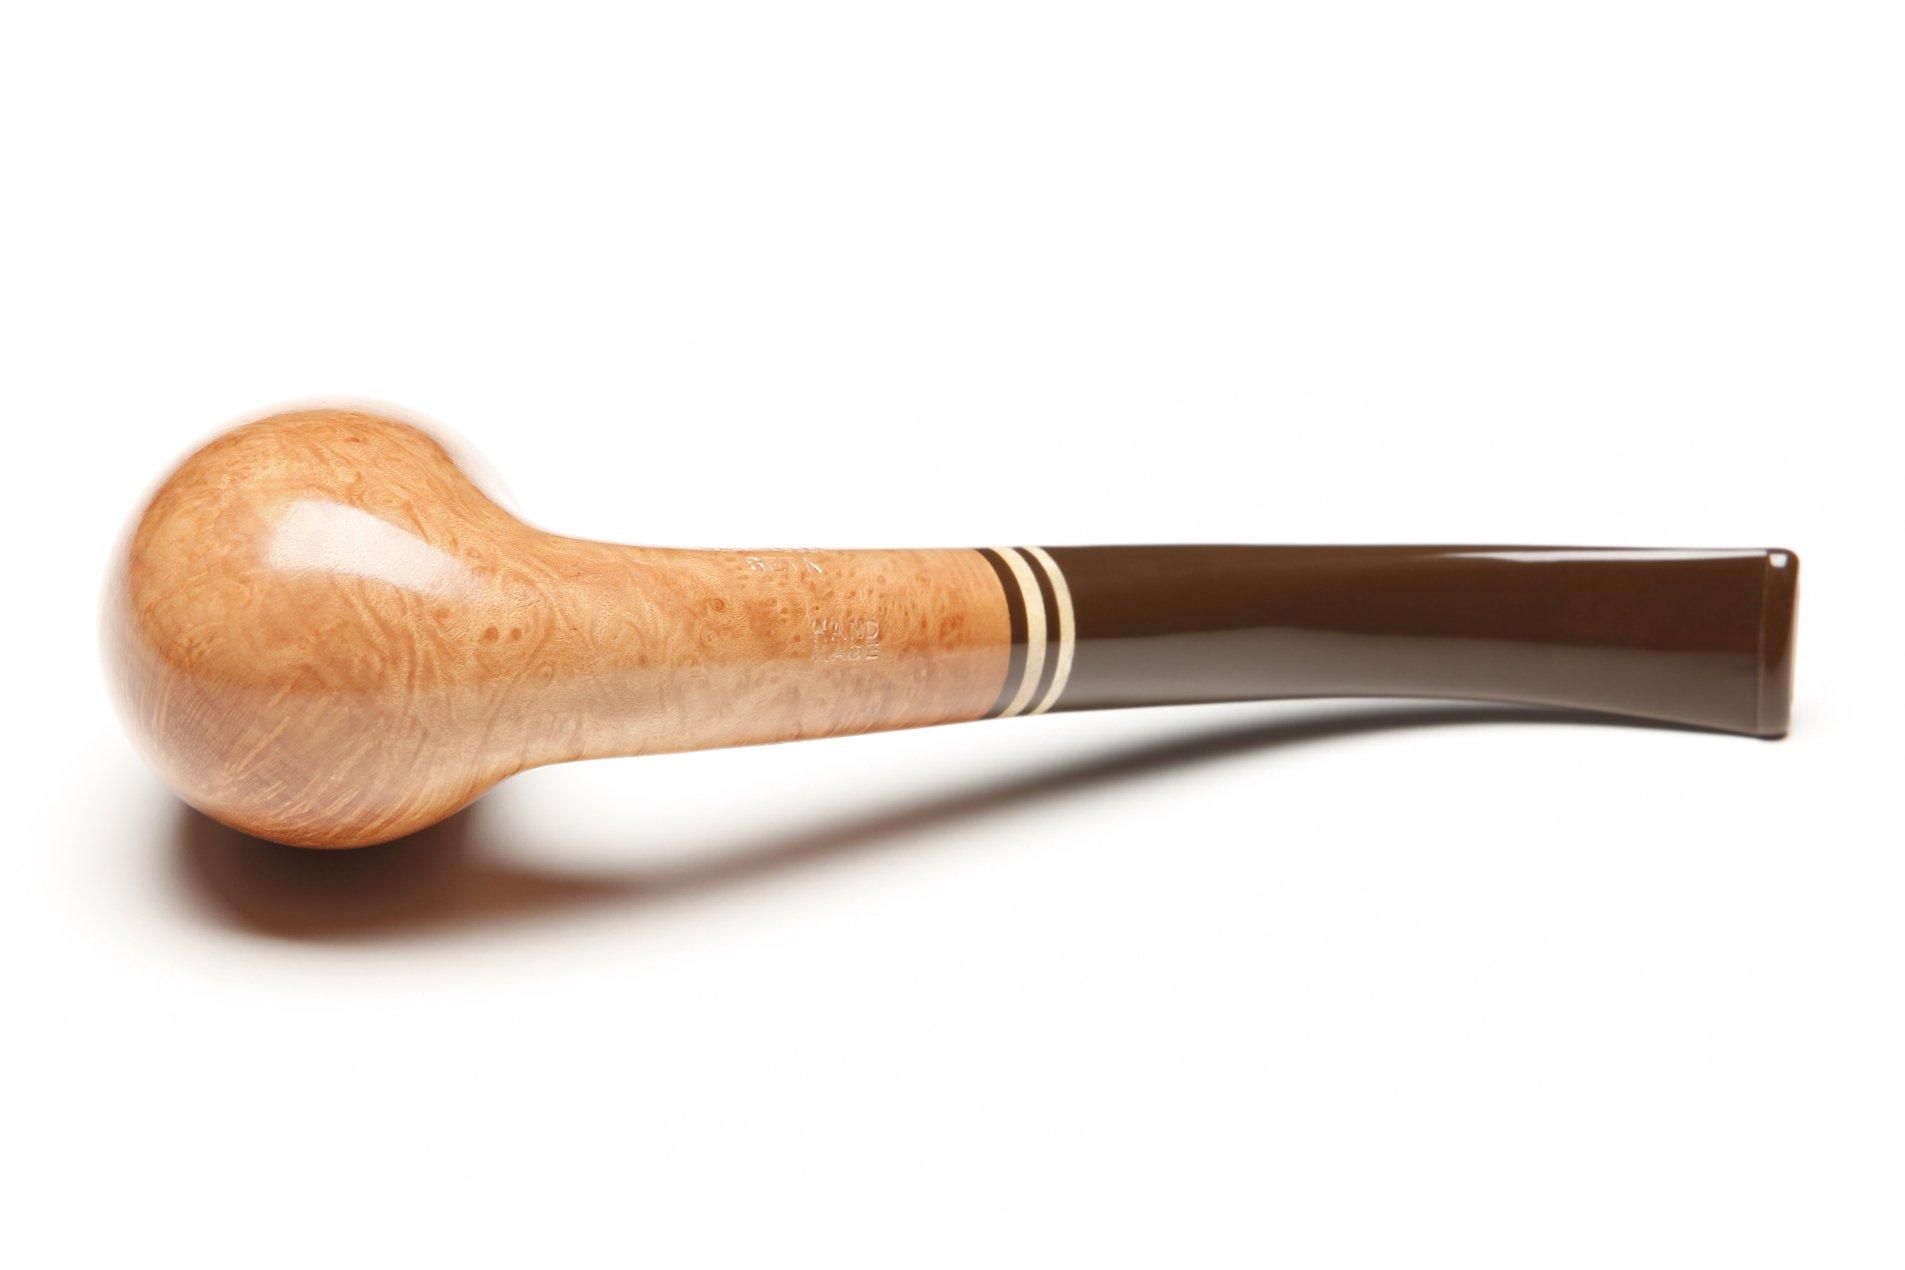 Savinelli Seta Smooth 606 KS Natural Tobacco Pipe by Savinelli (Image #4)